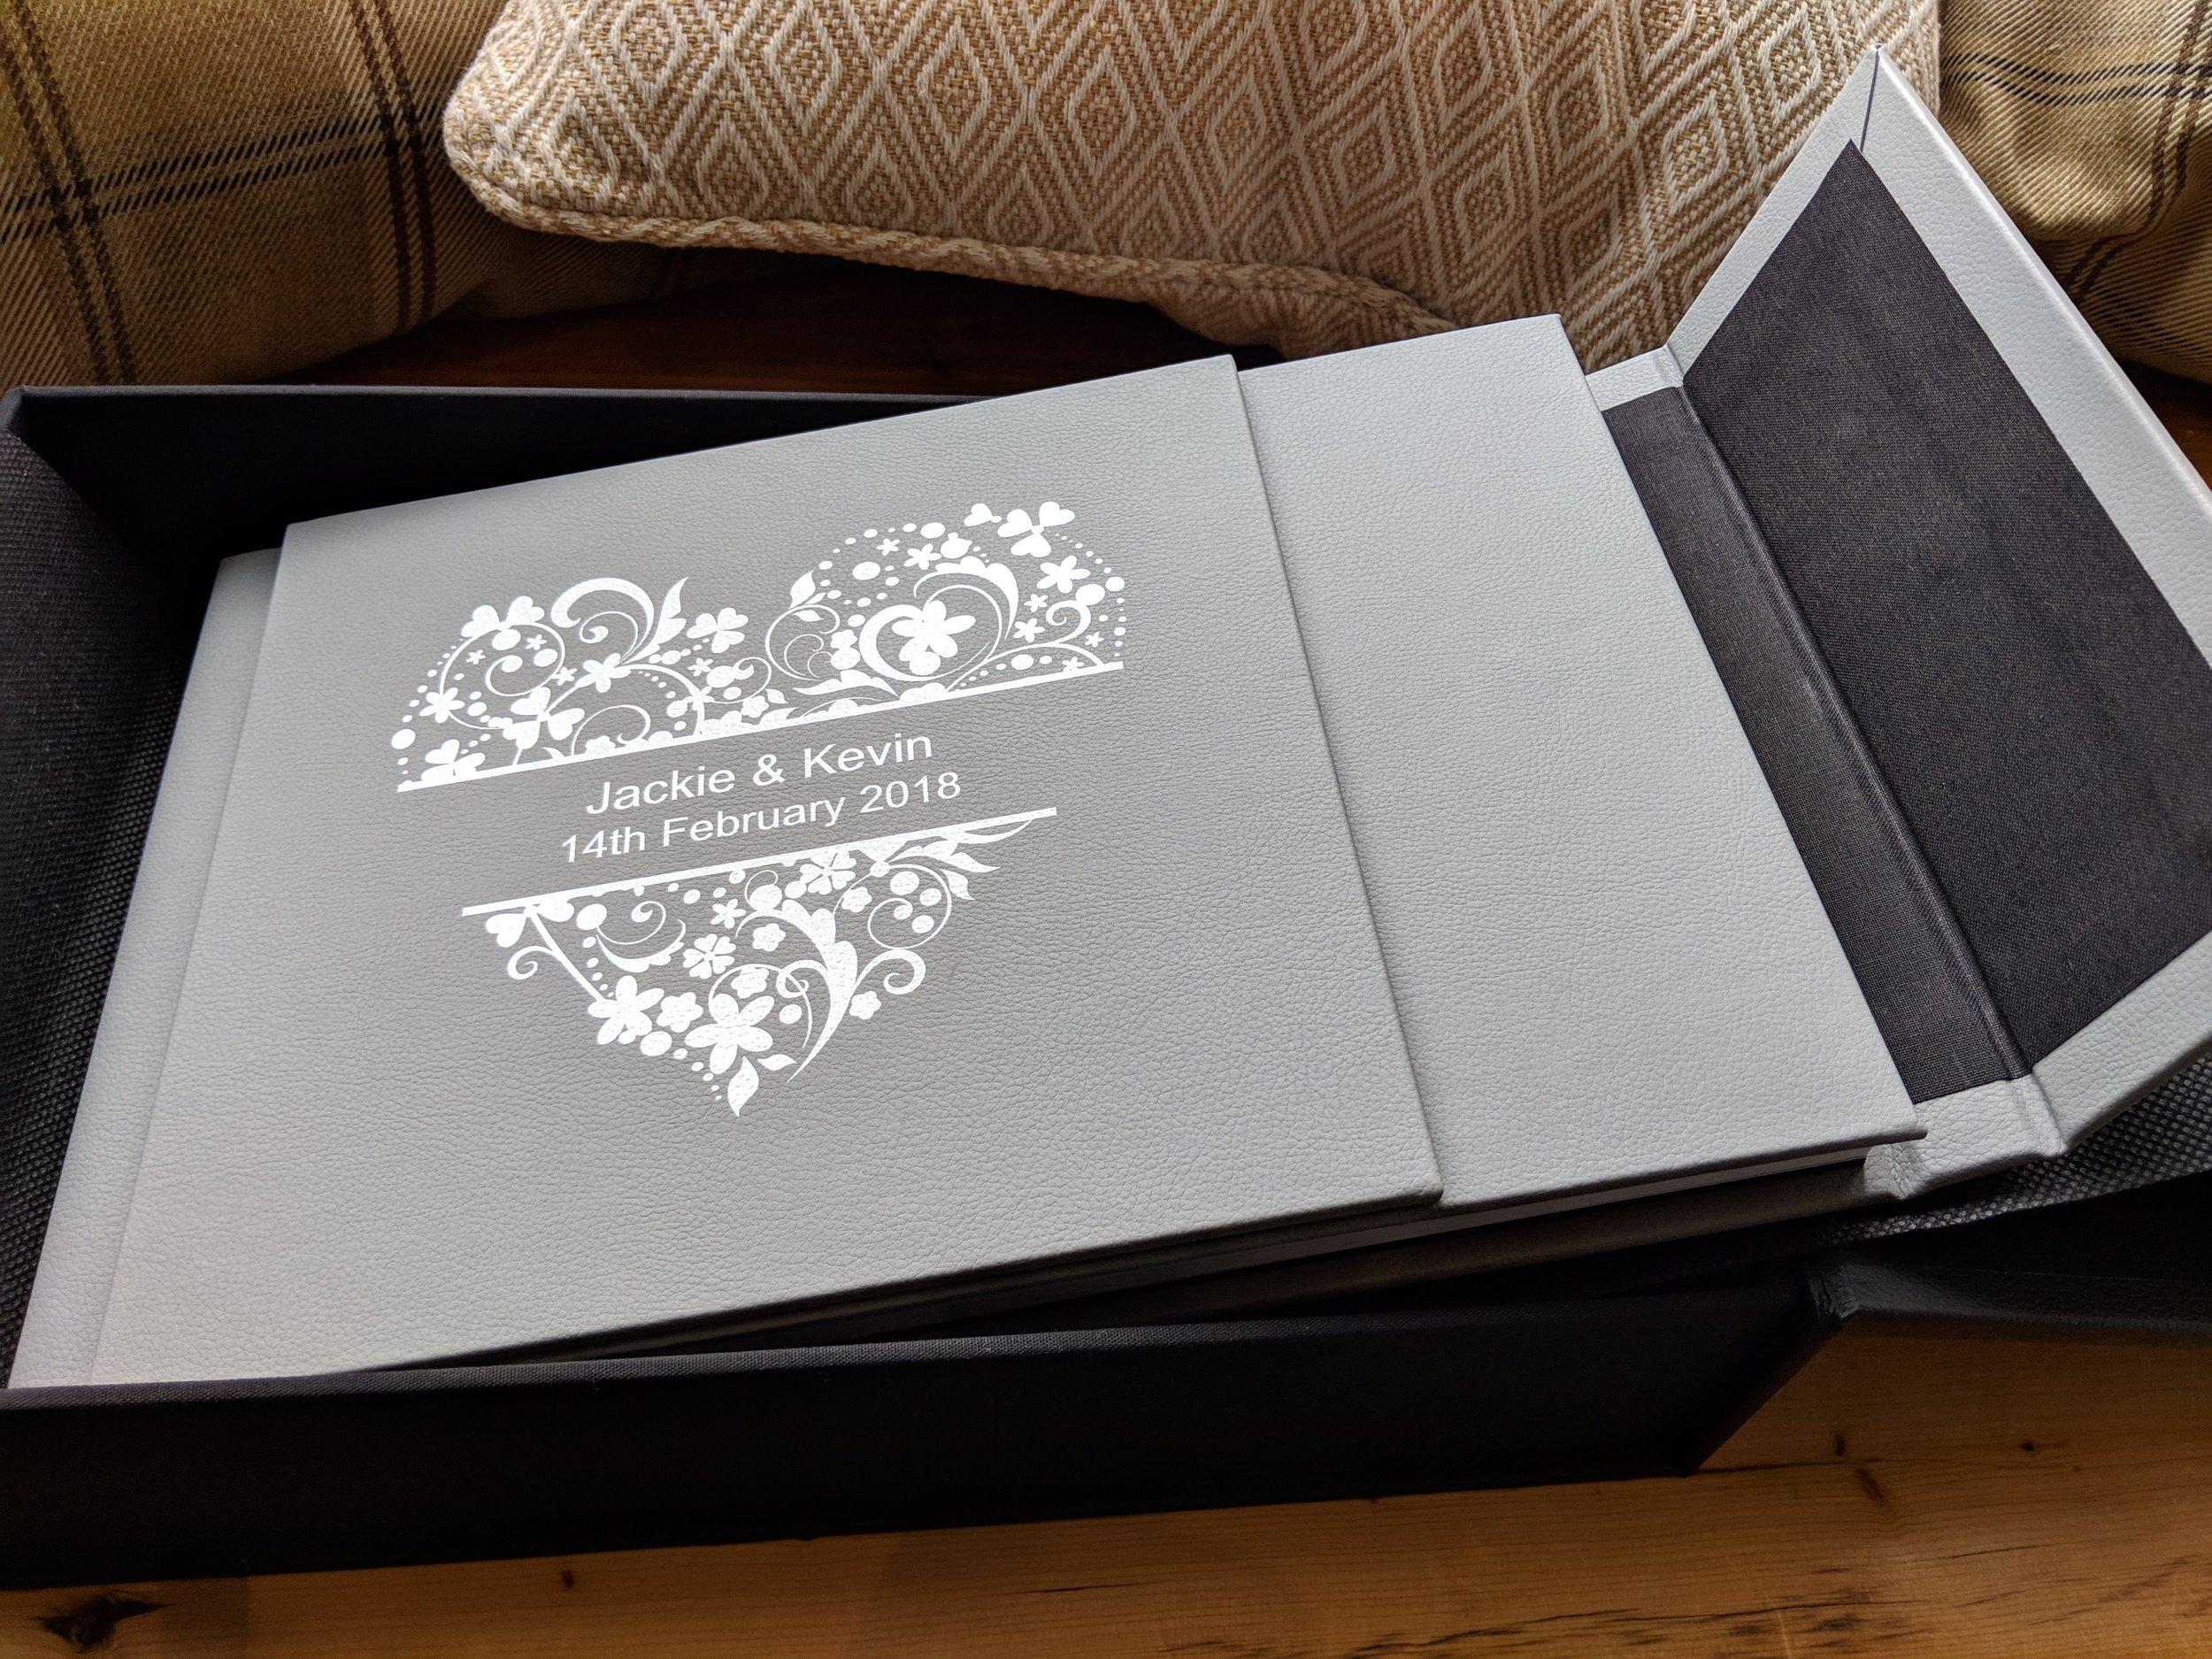 wedding-photography-album-bellissimo-perfetto-jackie-kevin-6.jpg